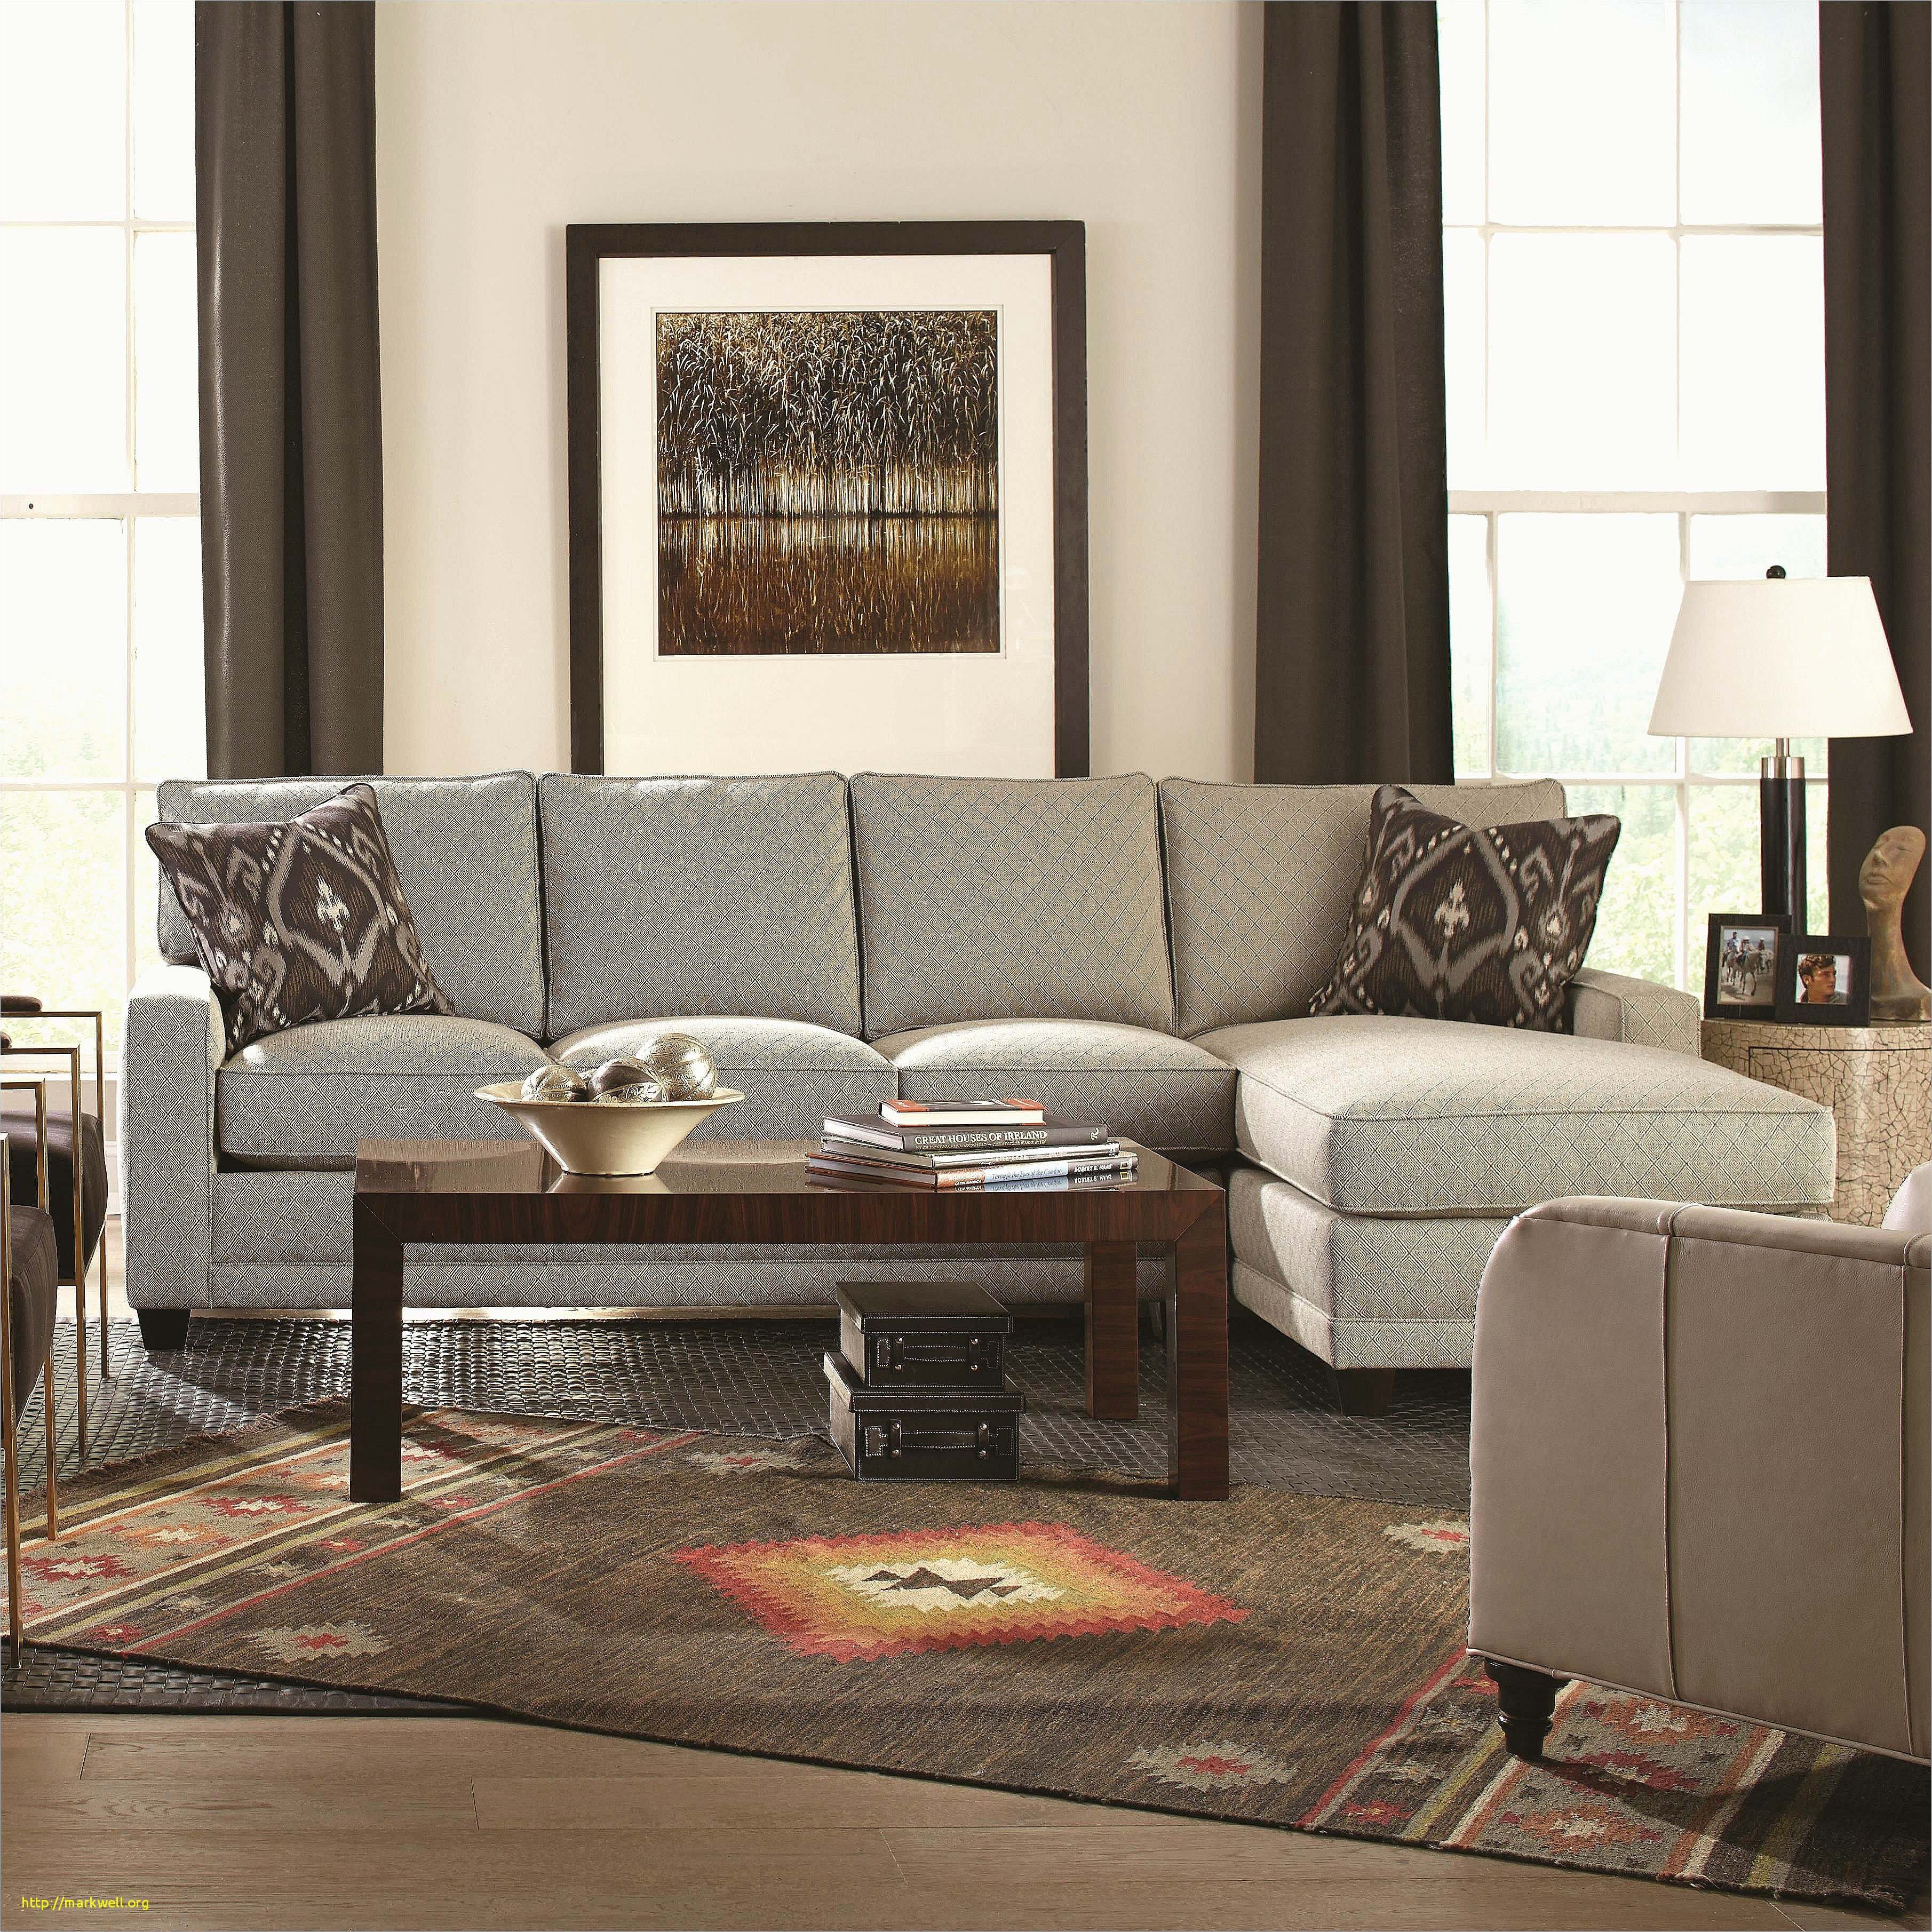 Small Recliners for Bedroom Unique Unique Living Room Accent Furniture